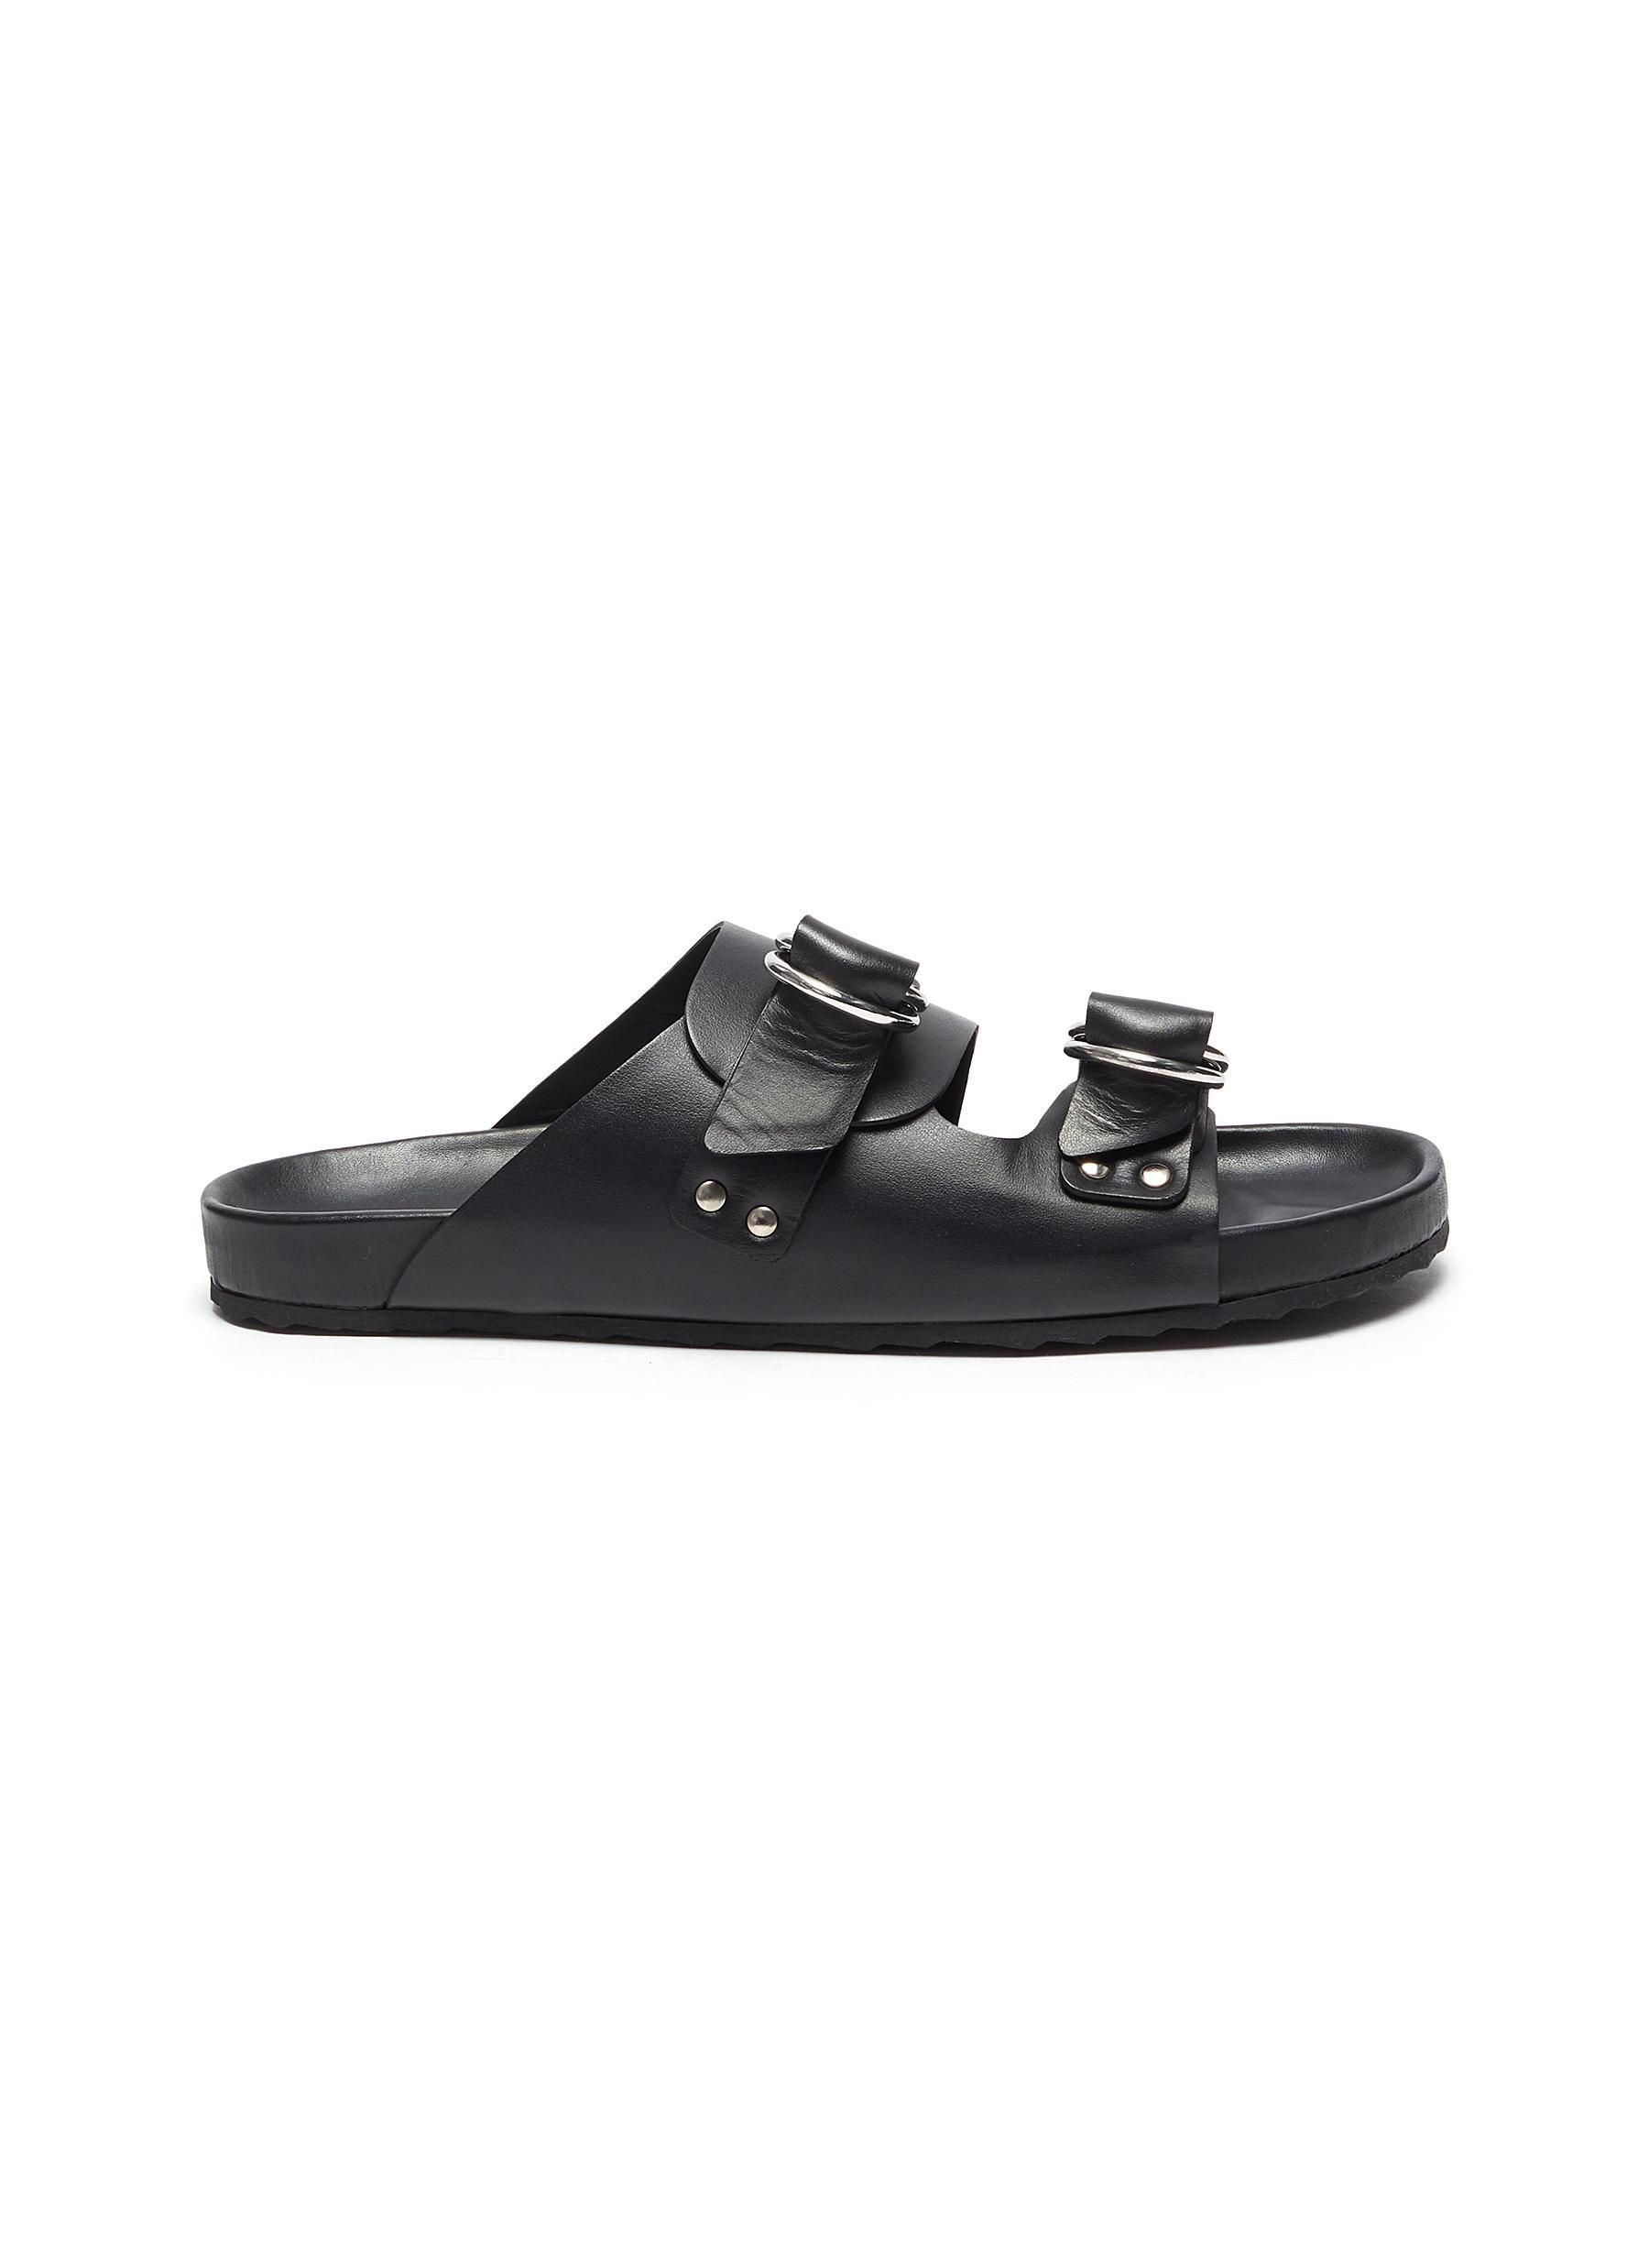 Double strap leather beach sandals - PIERRE HARDY - Modalova